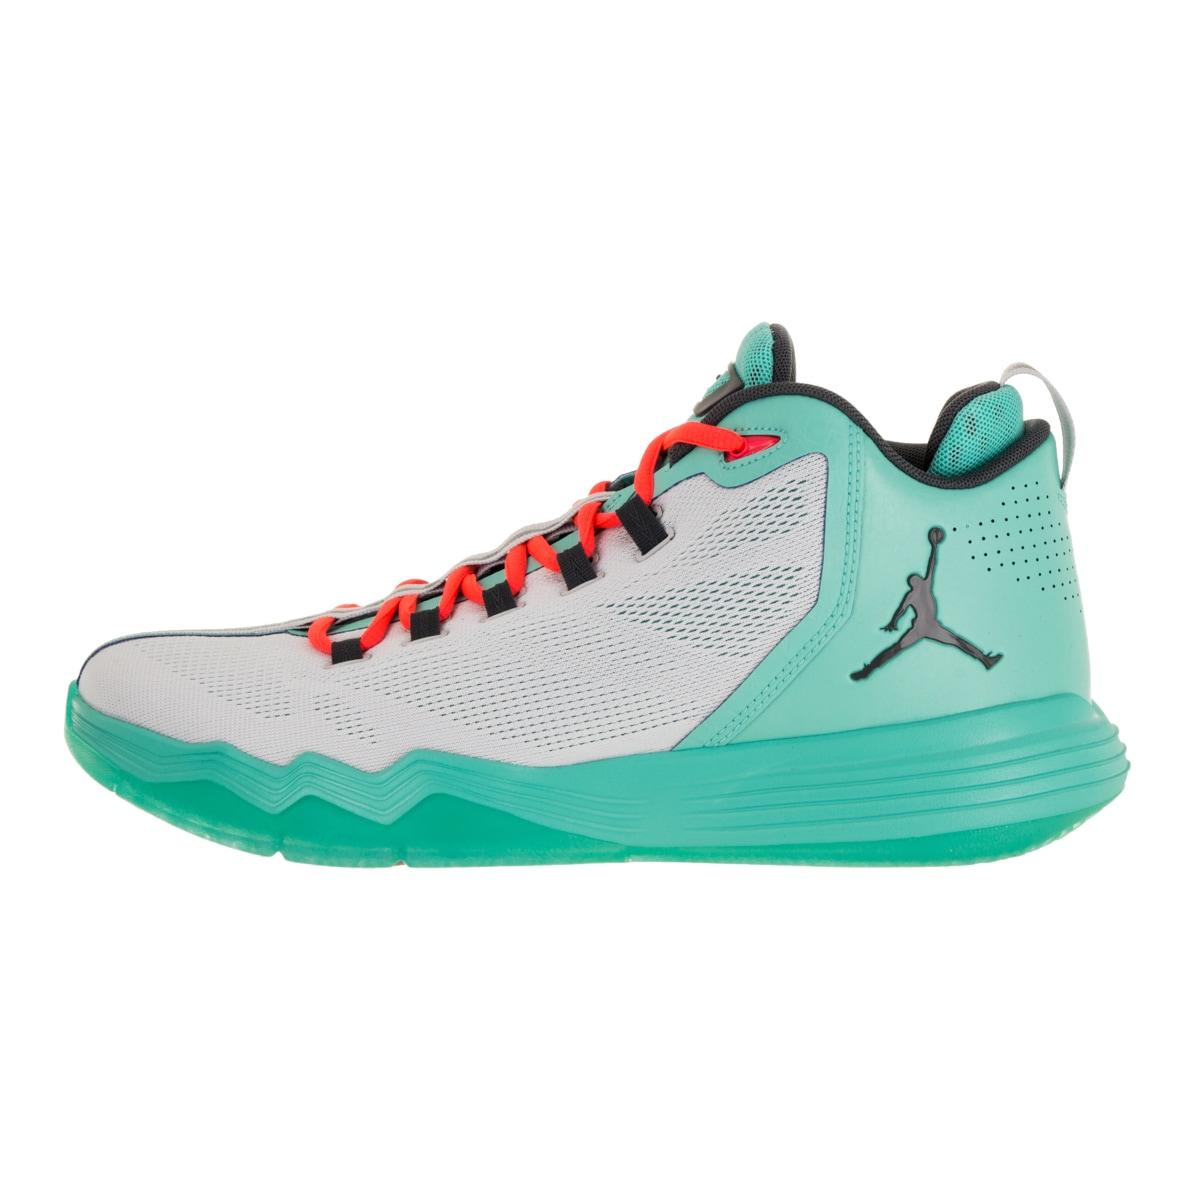 pretty nice 3328f 649a0 Shop Nike Jordan Men s Jordan Cp3.Ix Ae  Dark Grey  Trq Infr Basketball Shoe  - Free Shipping Today - Overstock - 12318178